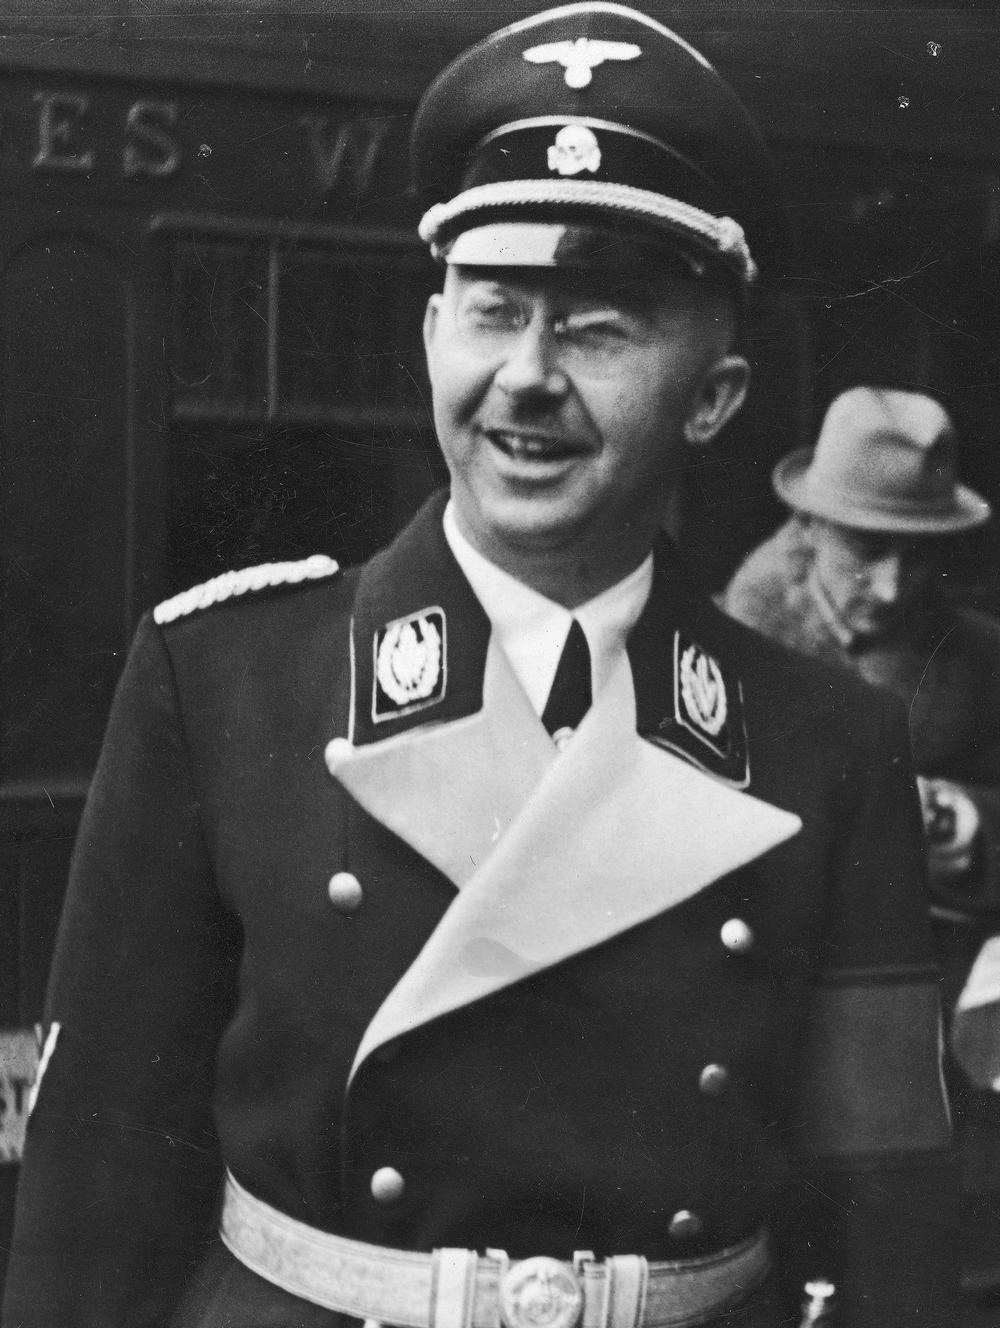 Twórca Lebensborn Reichsführer SS Heinrich Himmler (źródło: domena publiczna).